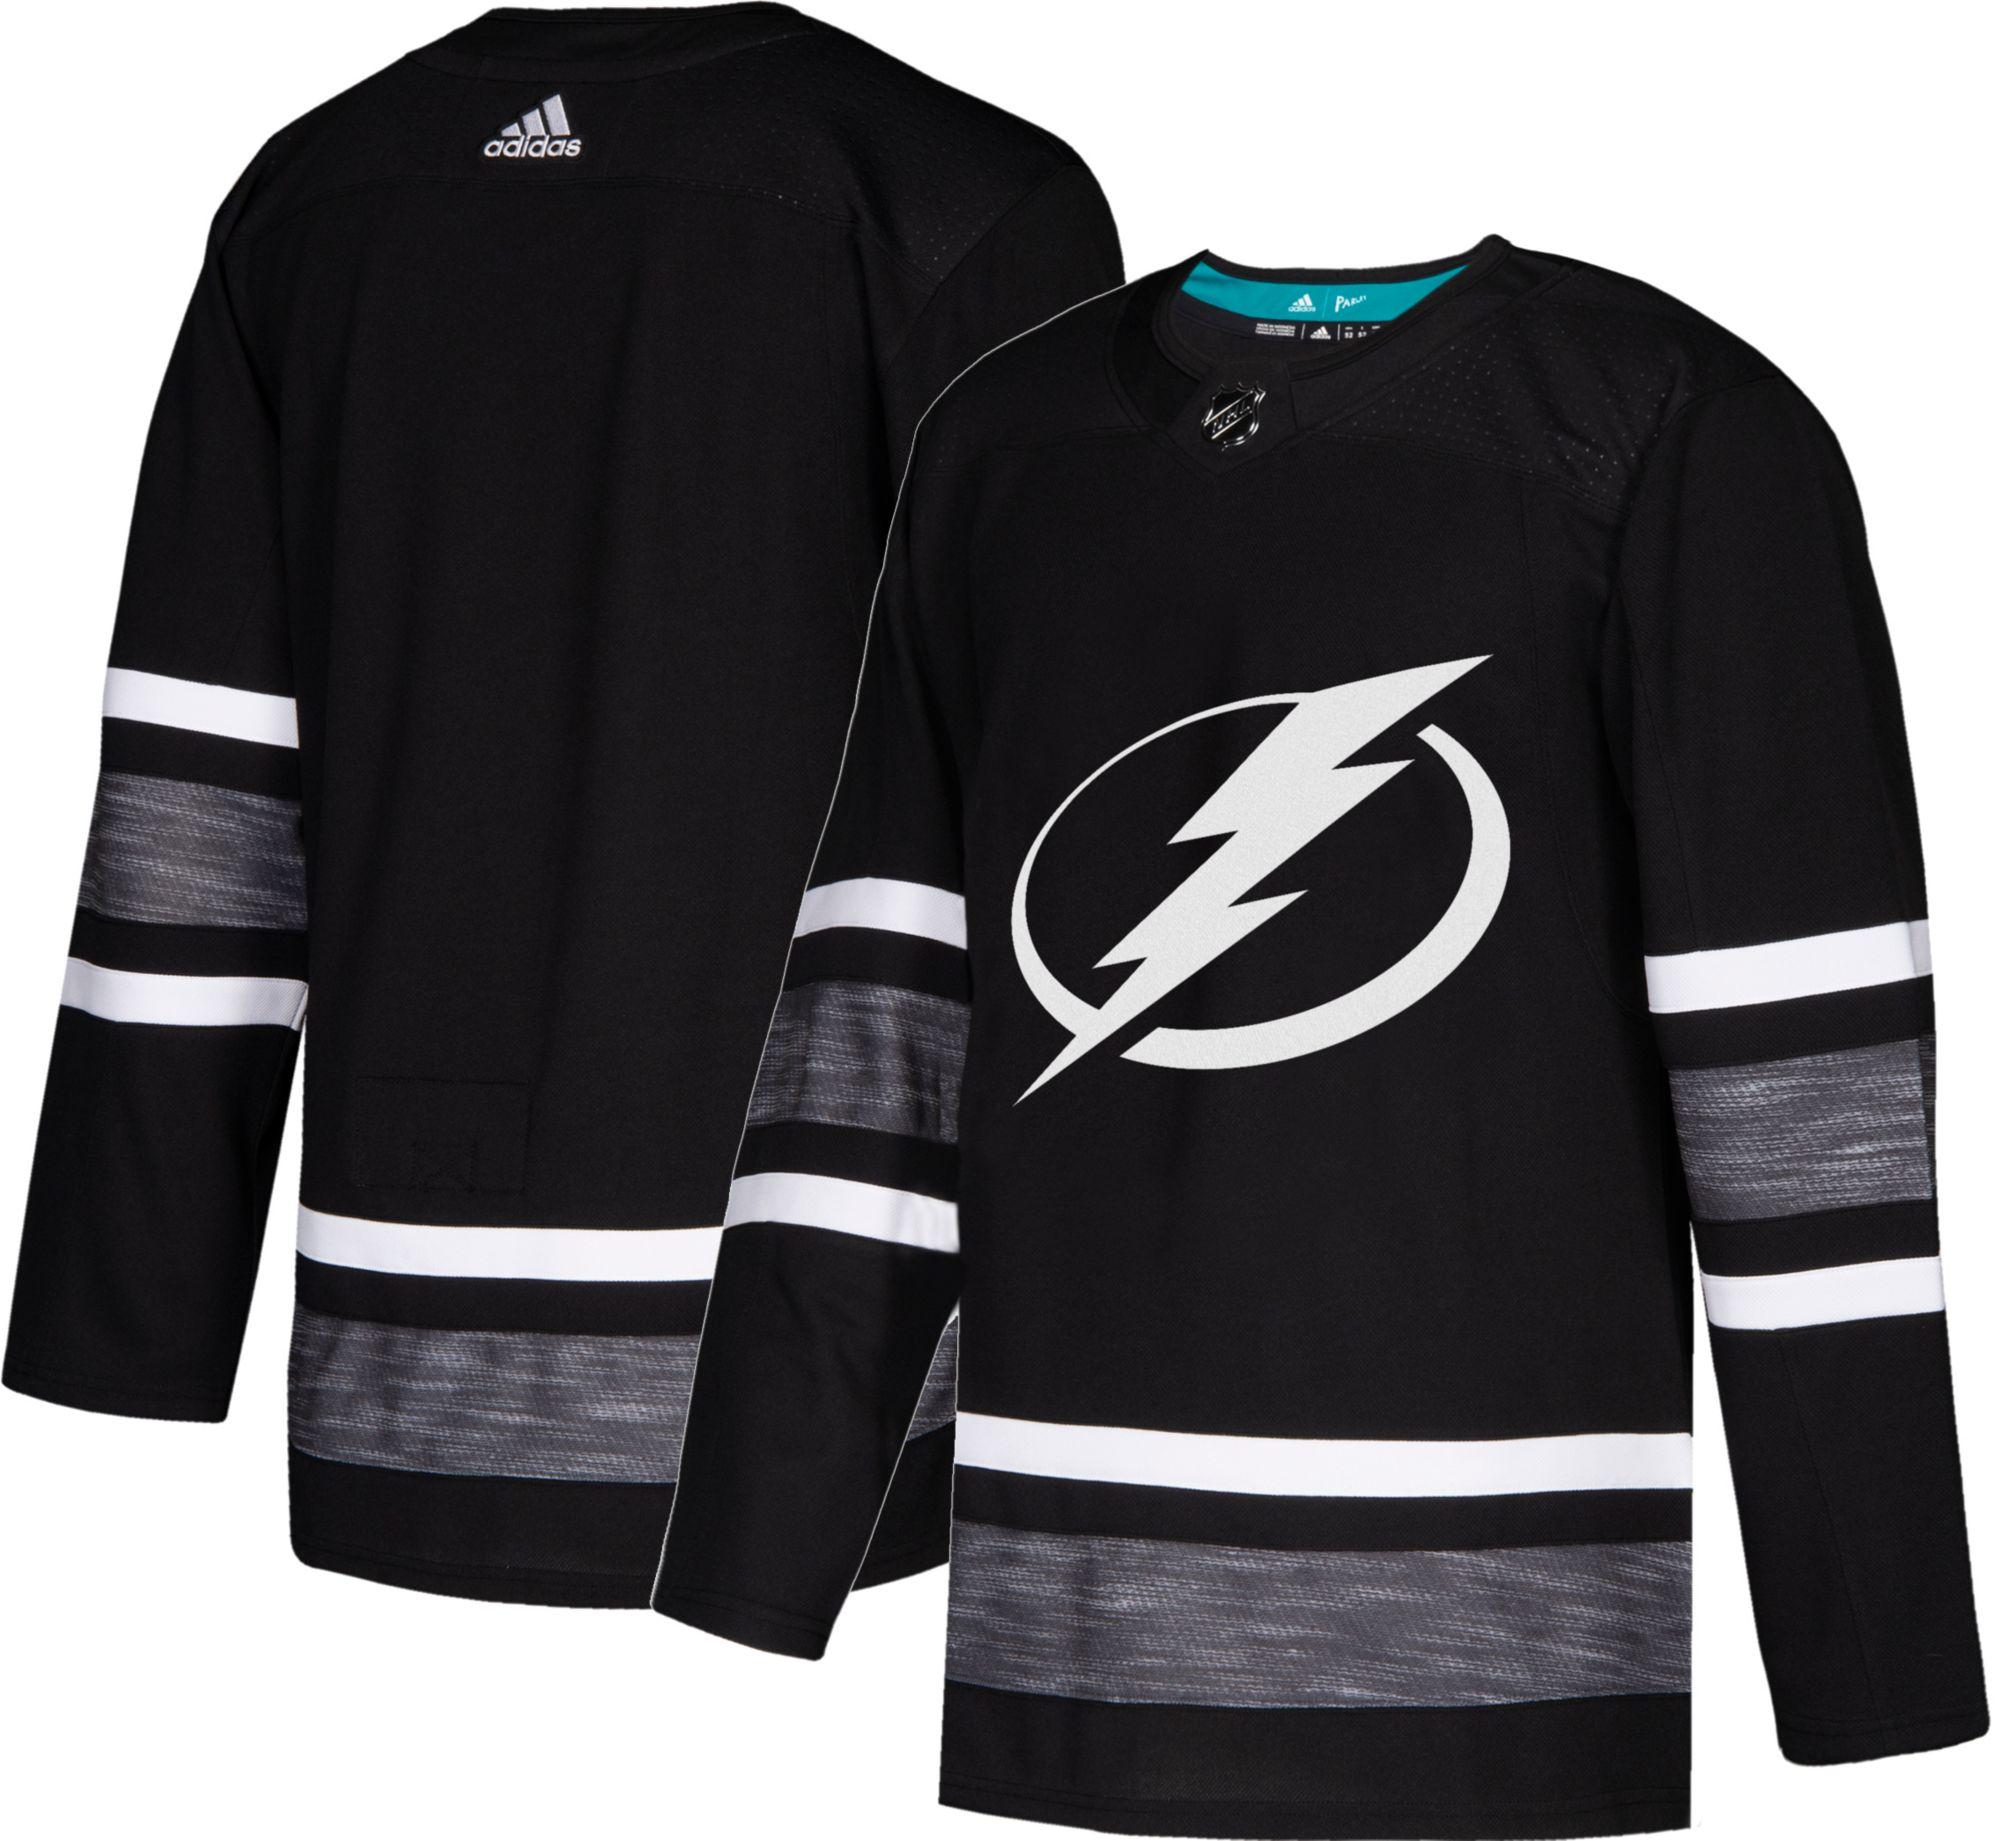 All Star Dogs Tampa Bay Lightning Pet Mesh Sports Jersey